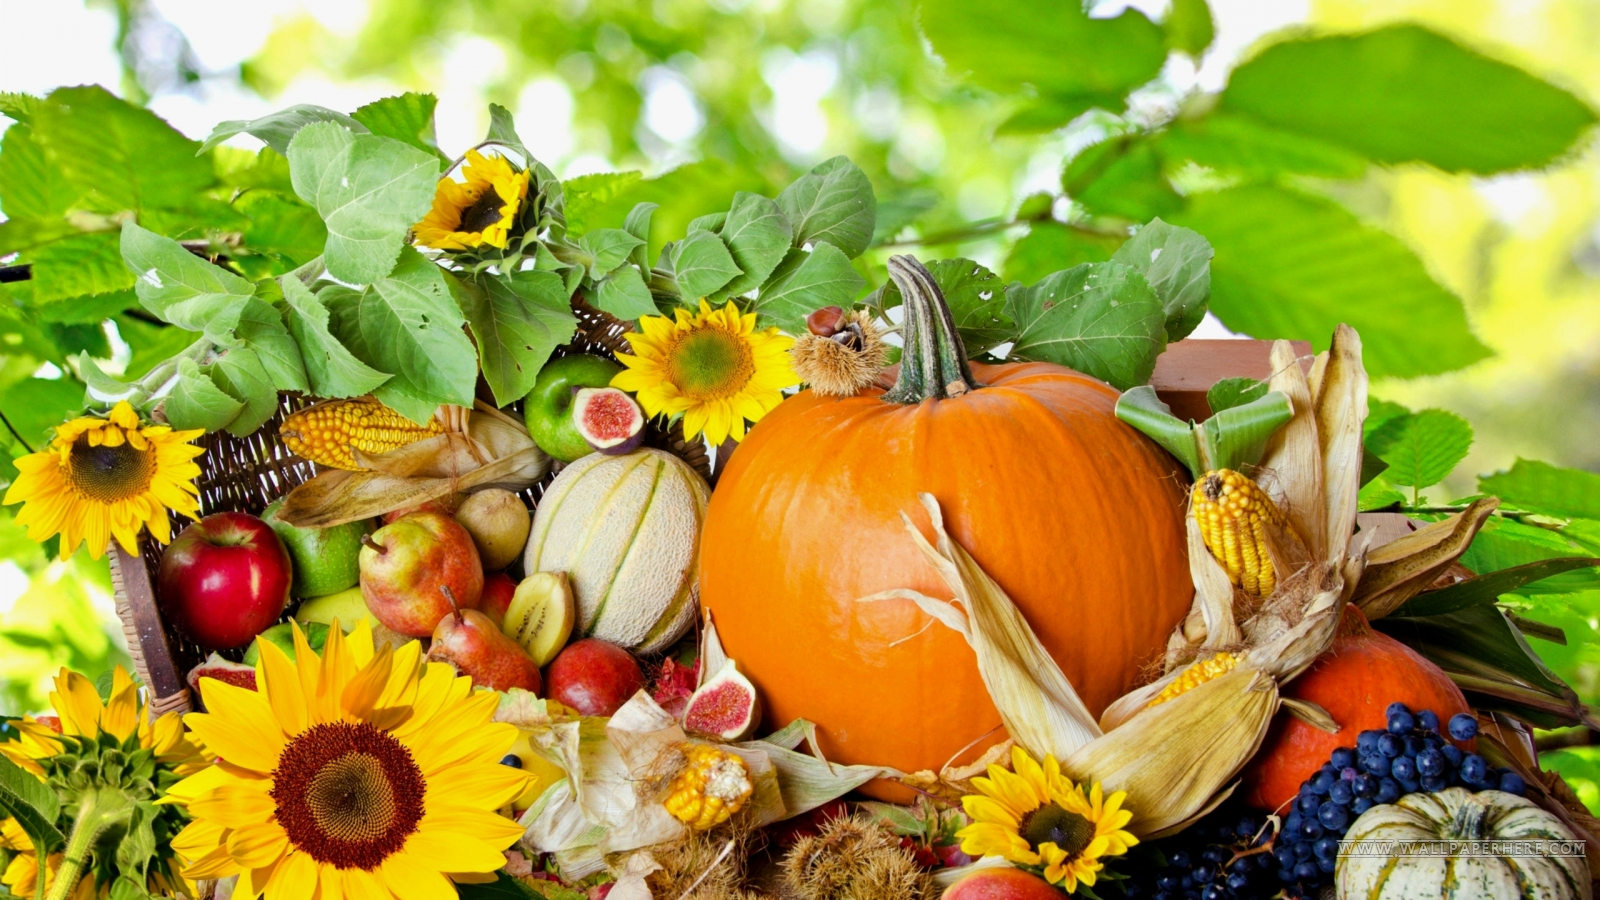 Thanksgiving wallpapers for desktop 1600x900 wallpapersafari - Wallpaper desktop thanksgiving ...